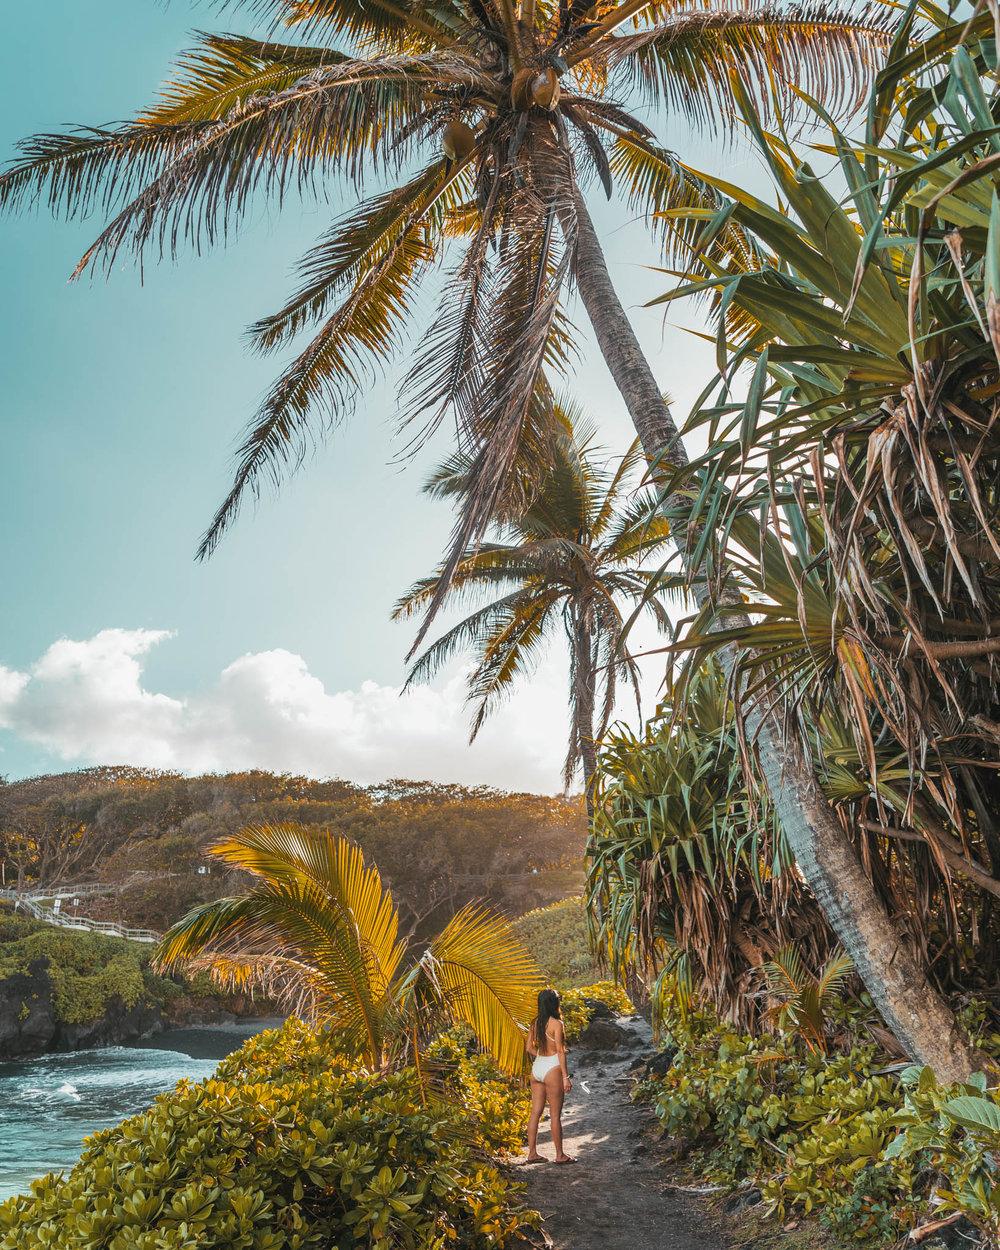 Wai'anapanapa State Park // The Quick Guide to Visiting Maui, Hawaii #readysetjetset #hawaii #maui